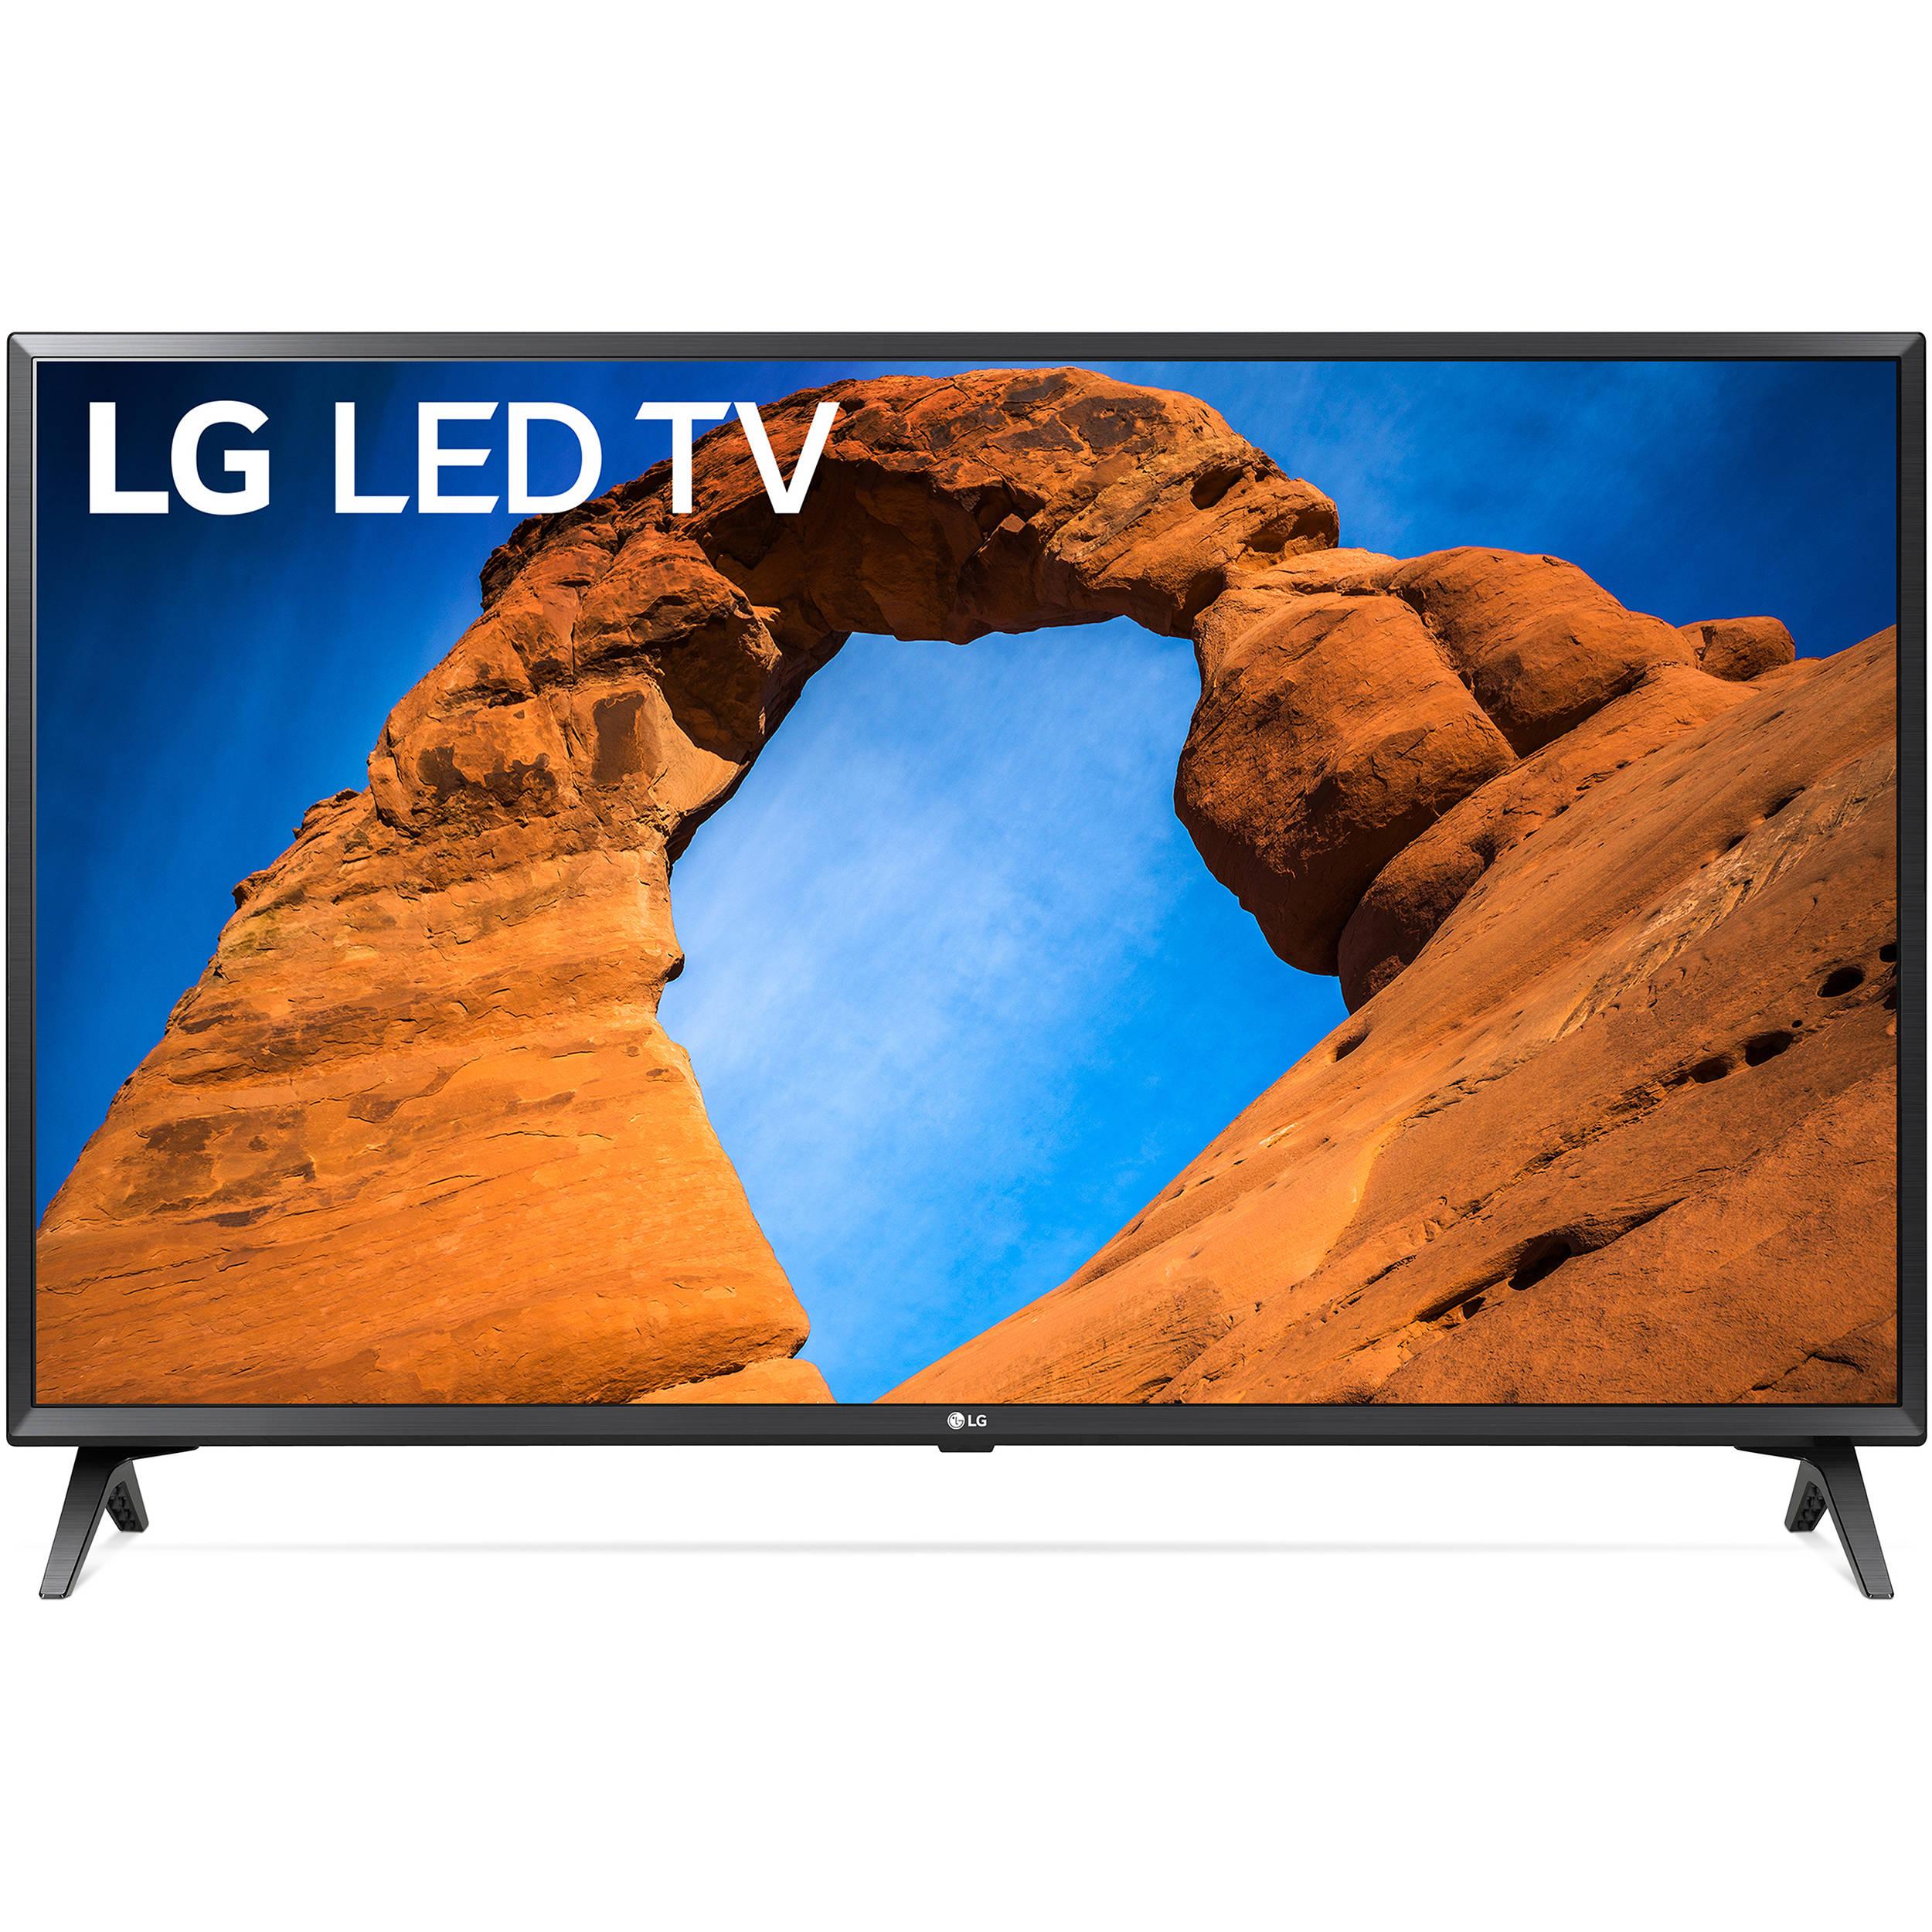 "LG 49/""-Class HDR Smart LED Full HD 1080p TV w// Accessories Bundle 2018"